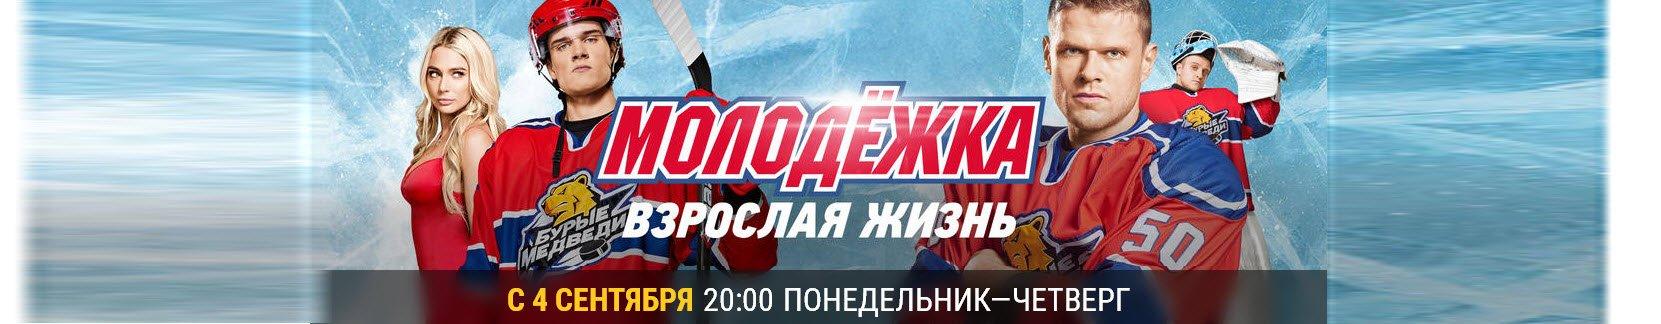 Сериал Молодежка 4 сезон смотреть онлайн 2016